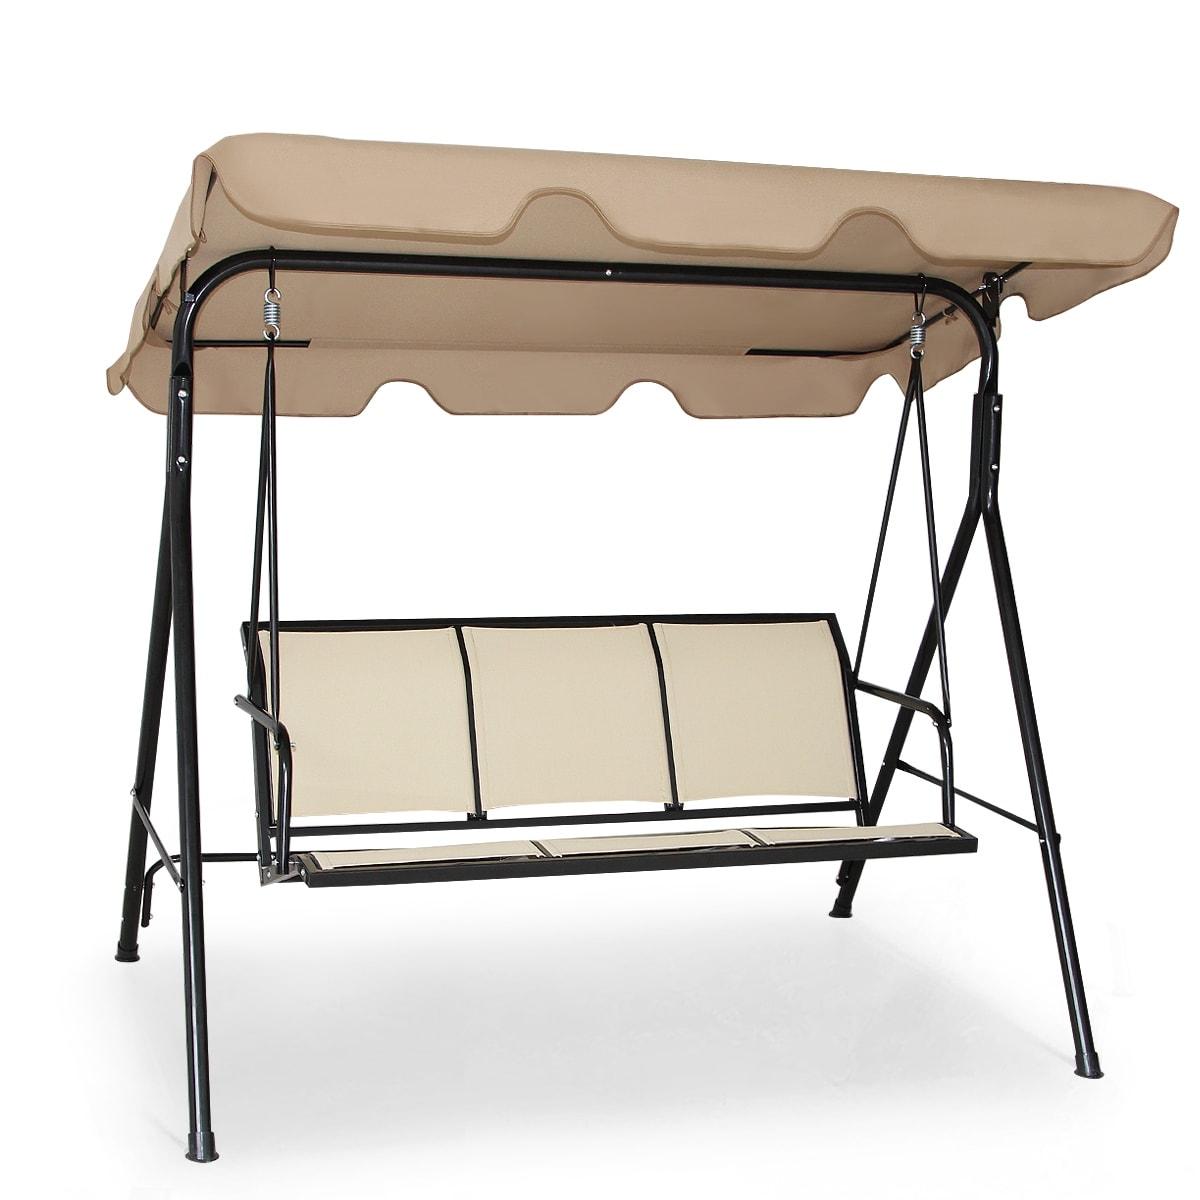 Costway Outdoor Patio Swing Canopy 3 Person Chair Hammock Brown